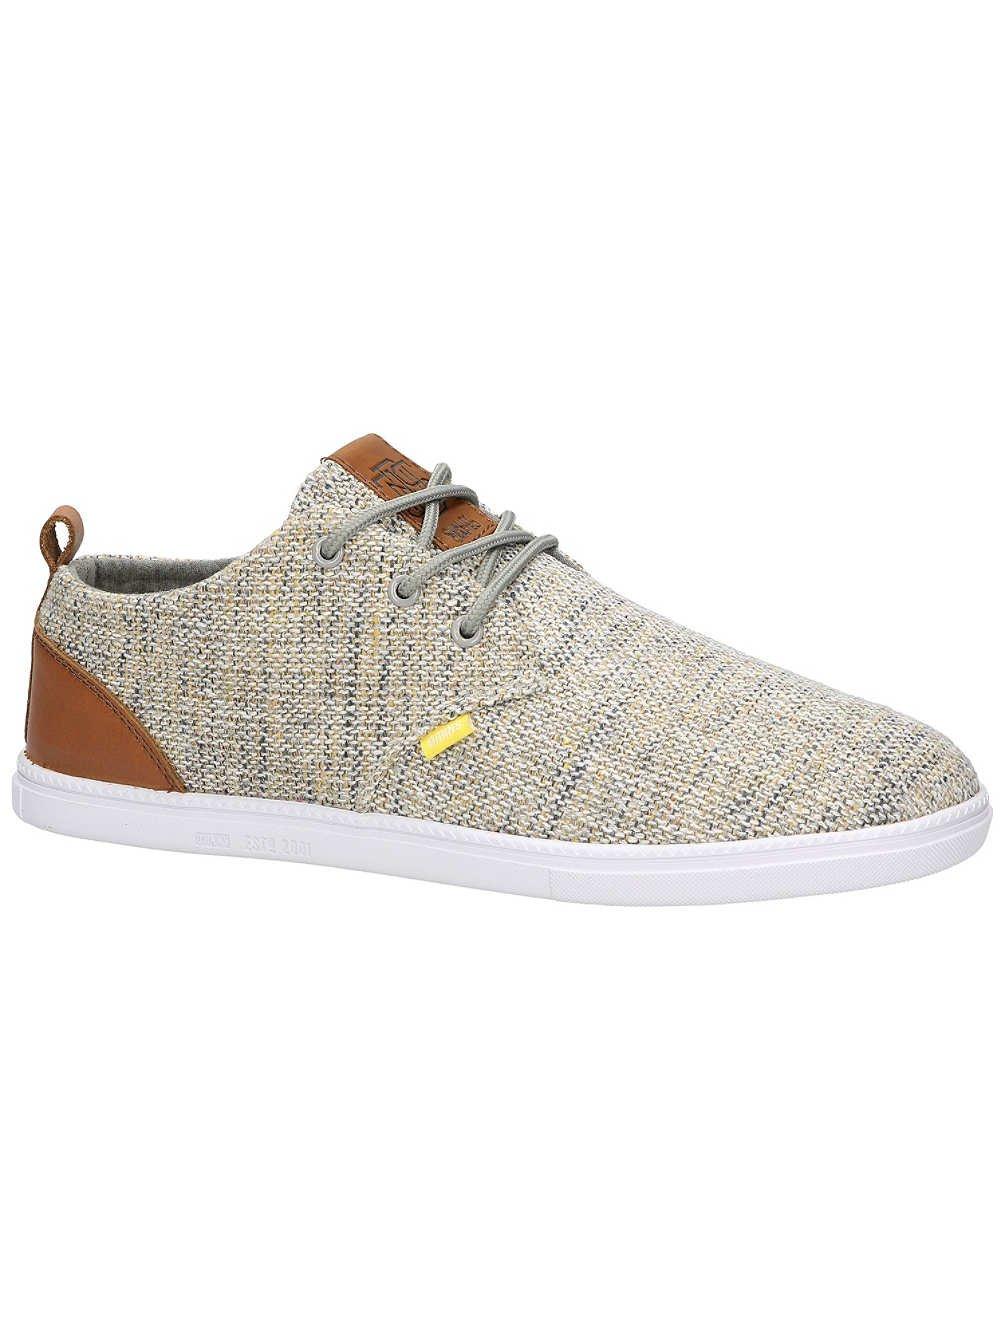 Djinns Homme Chaussures/Baskets Low Lau Colored Linen sEYgerAB